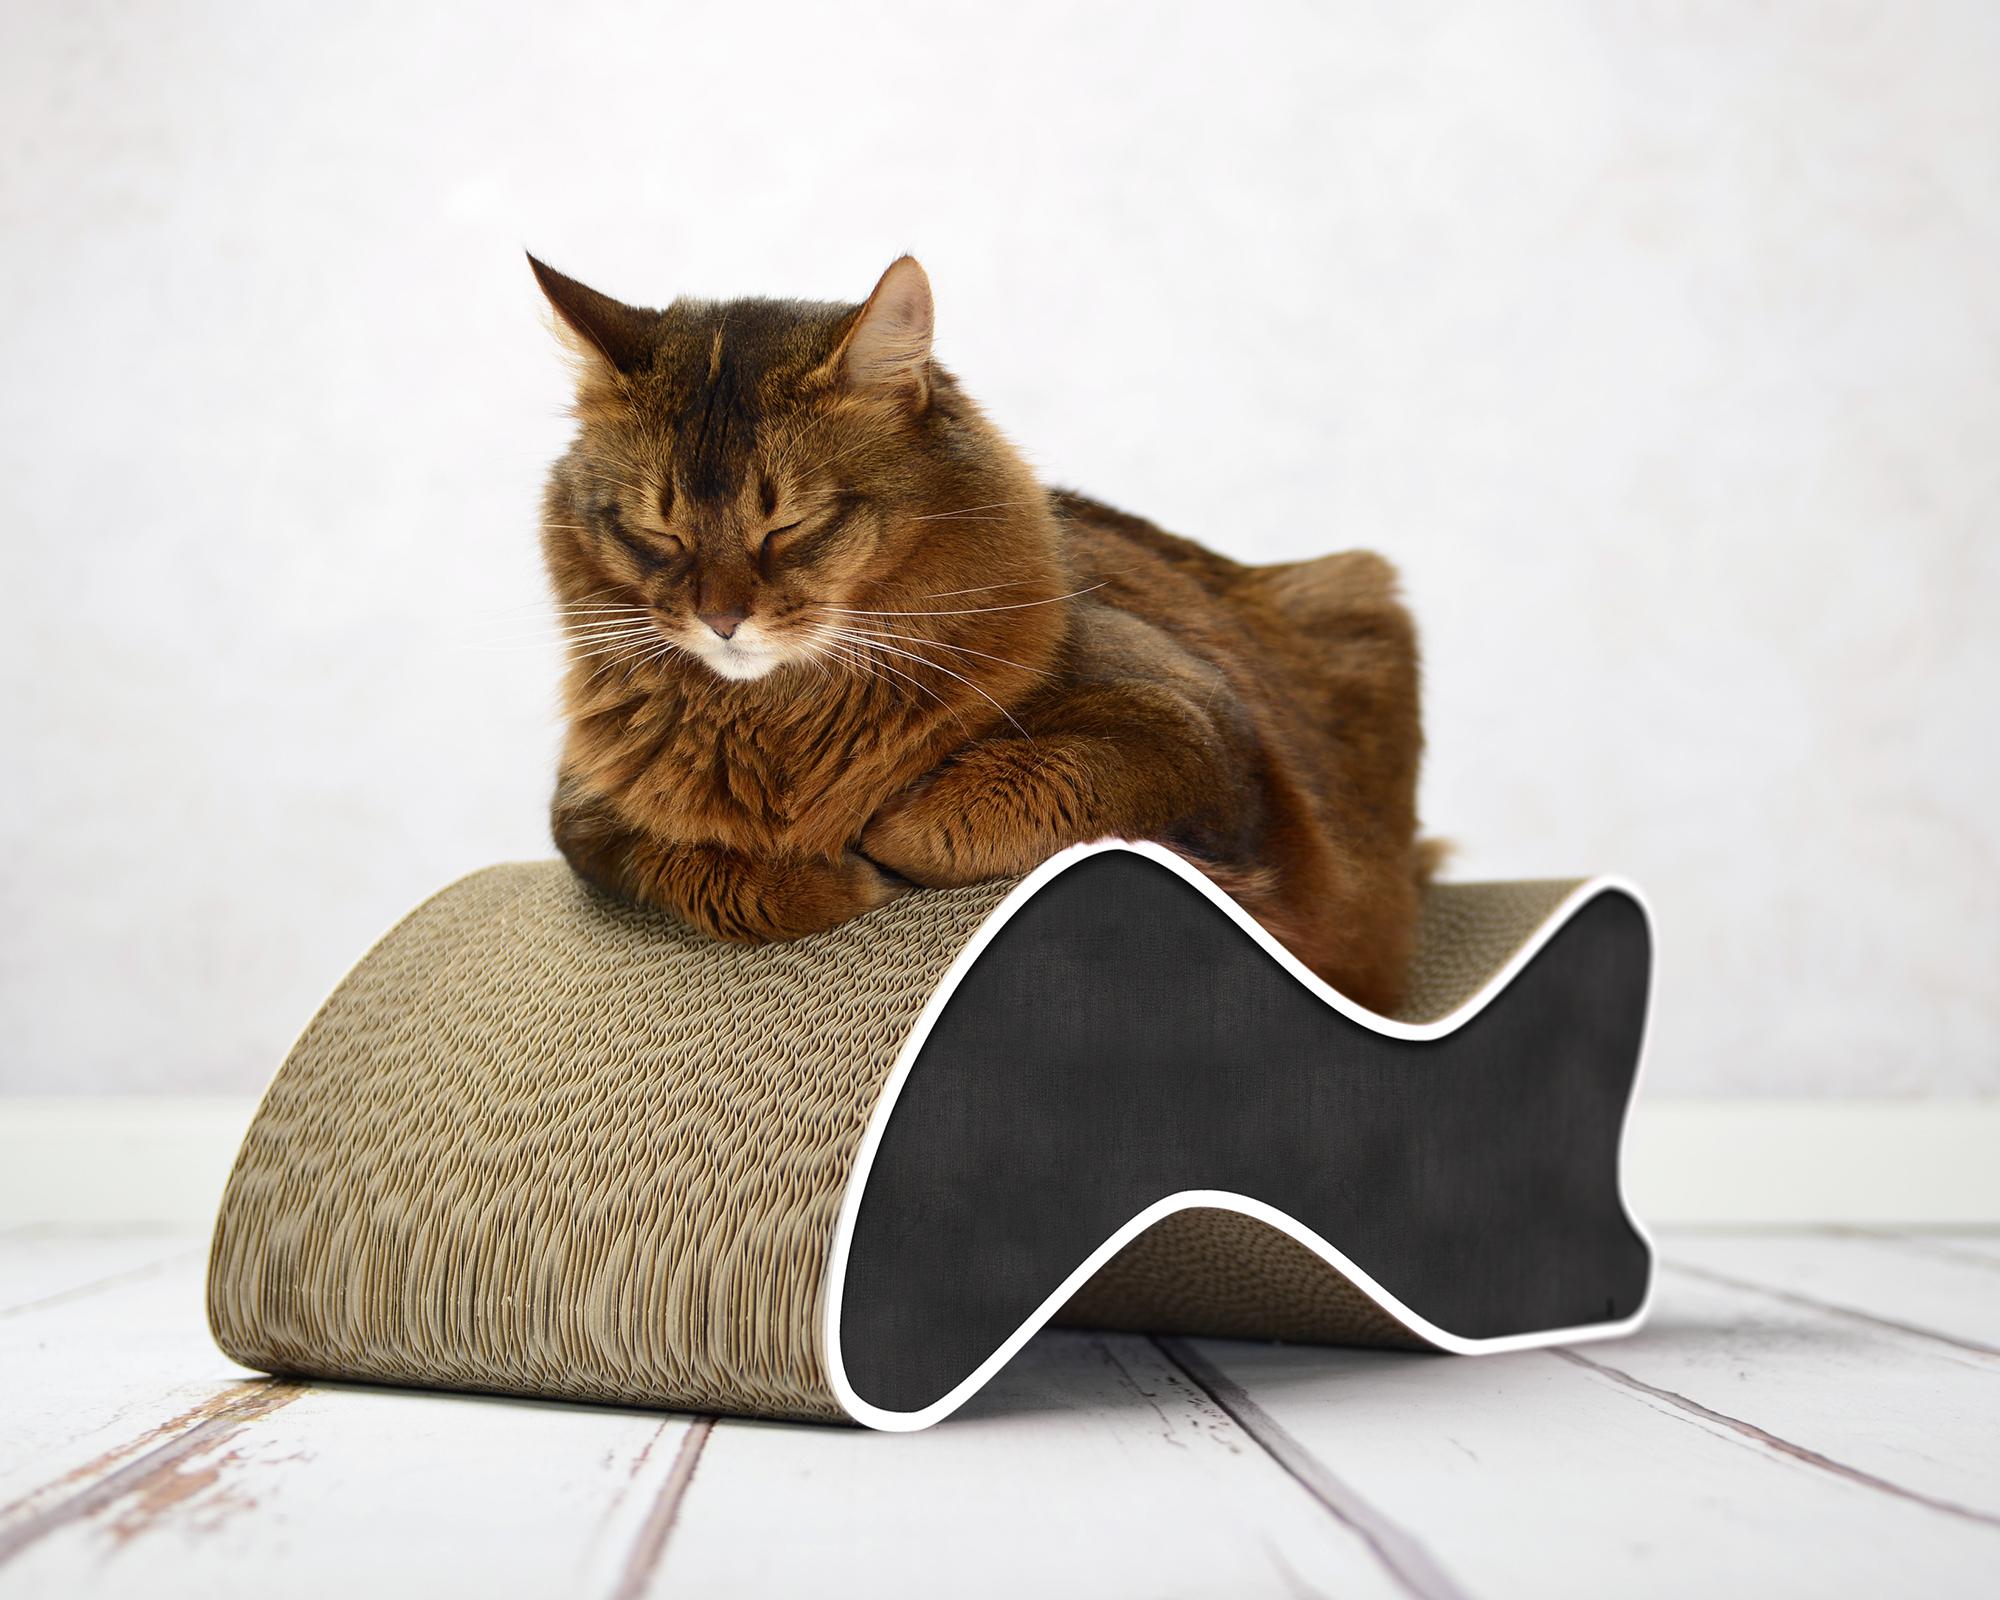 Katzenkratzmöbel Kabou aus fsc-zertifizierter Wellpappe